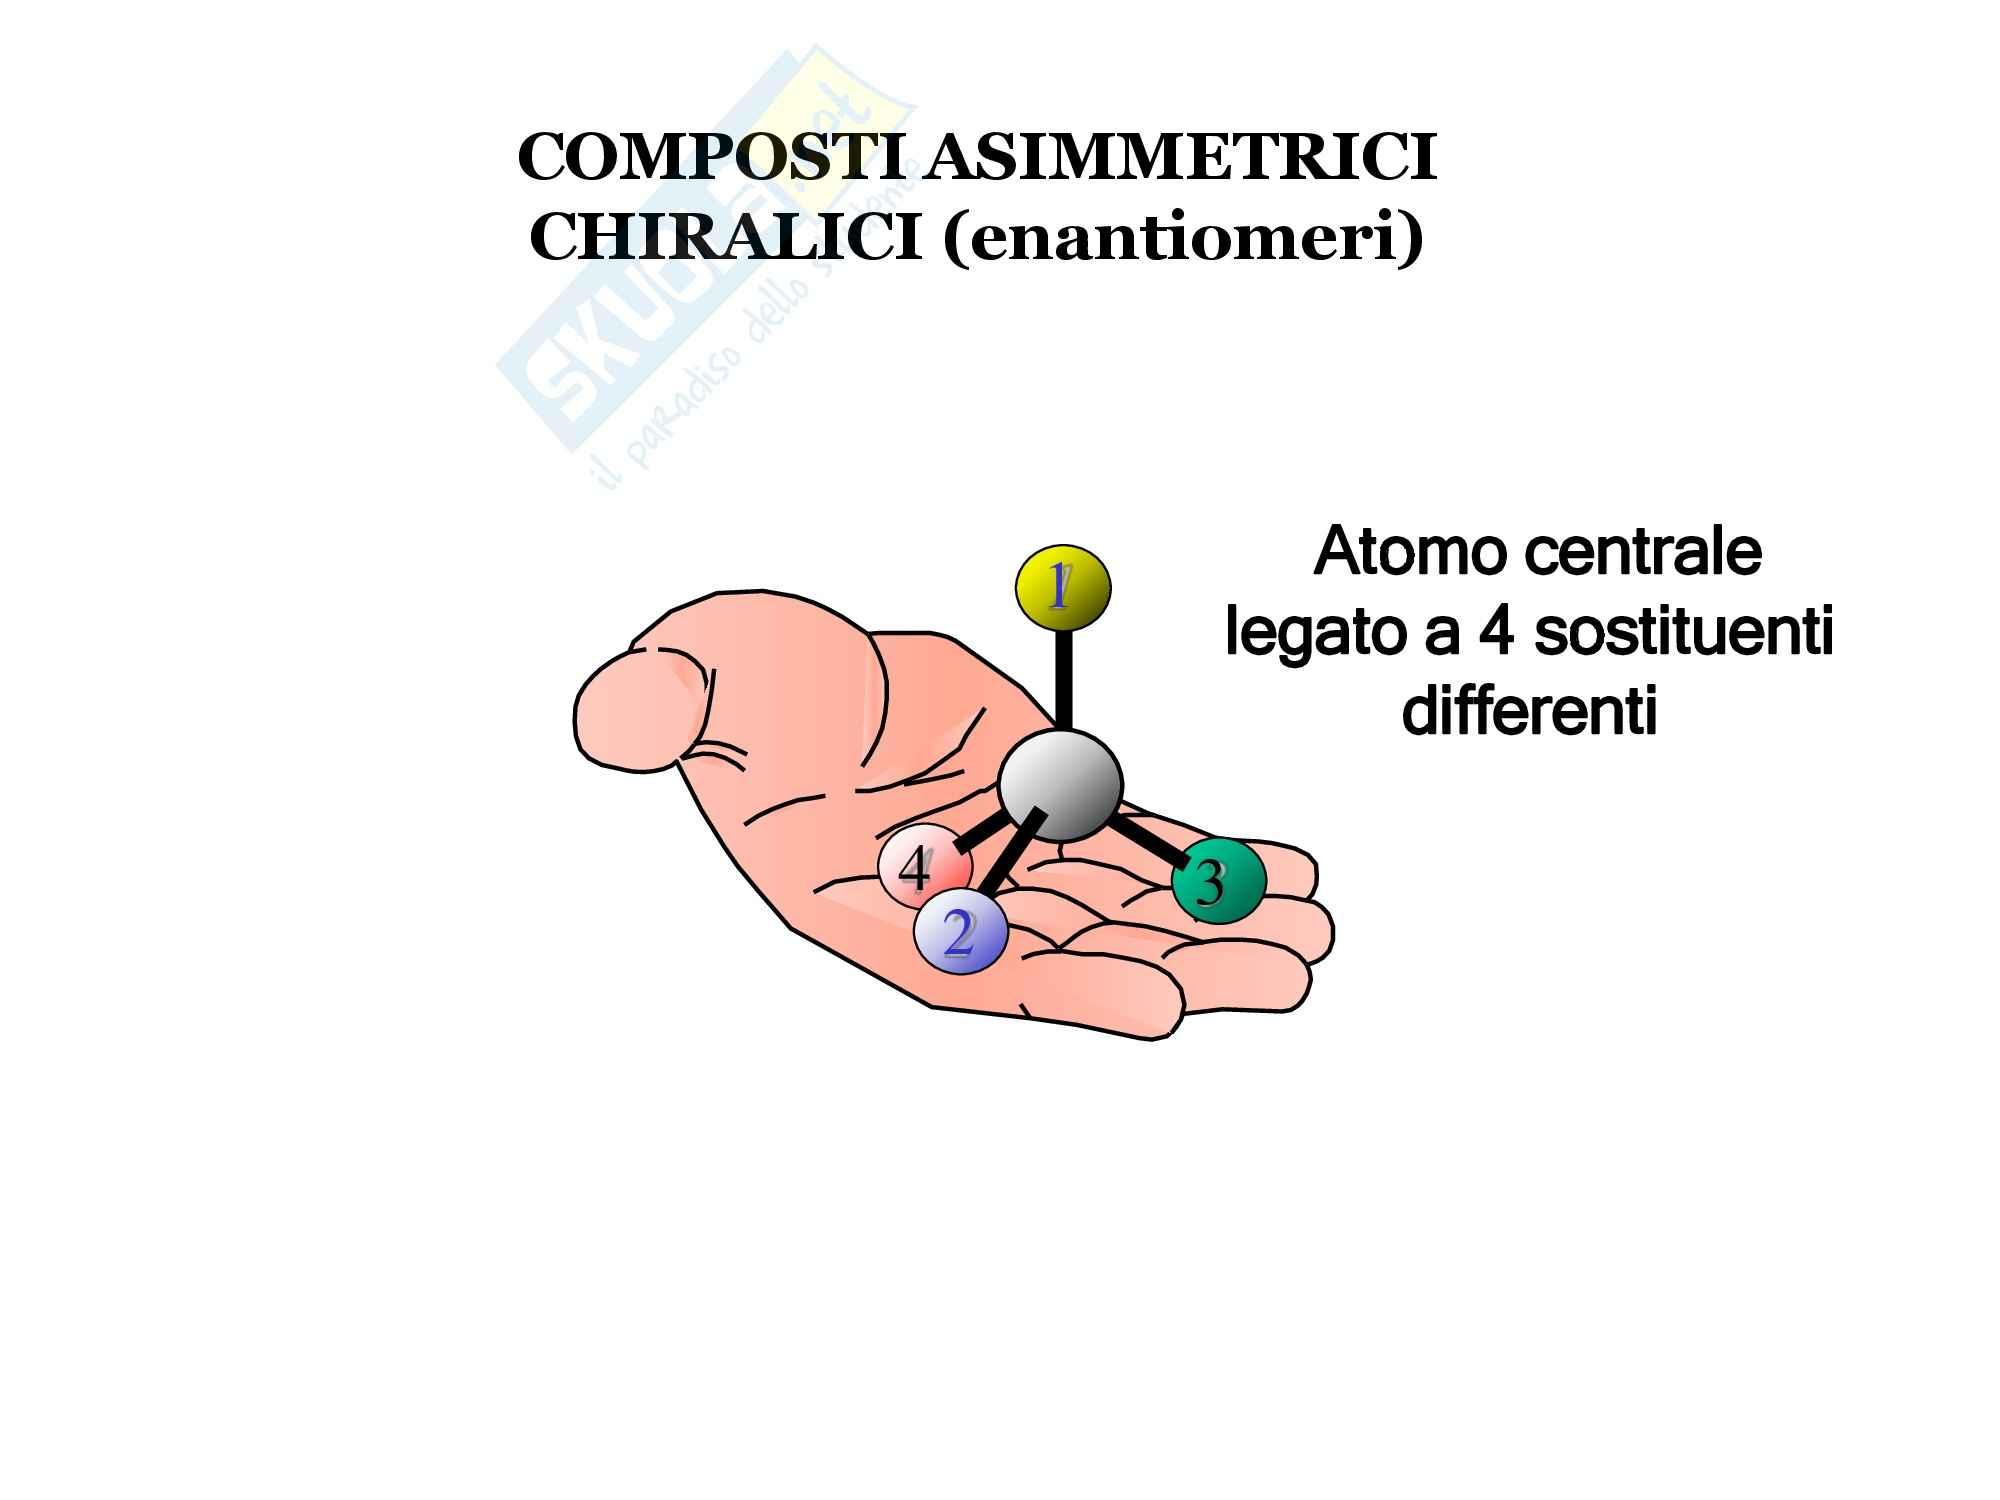 Chimica - Stereoisometria ottica